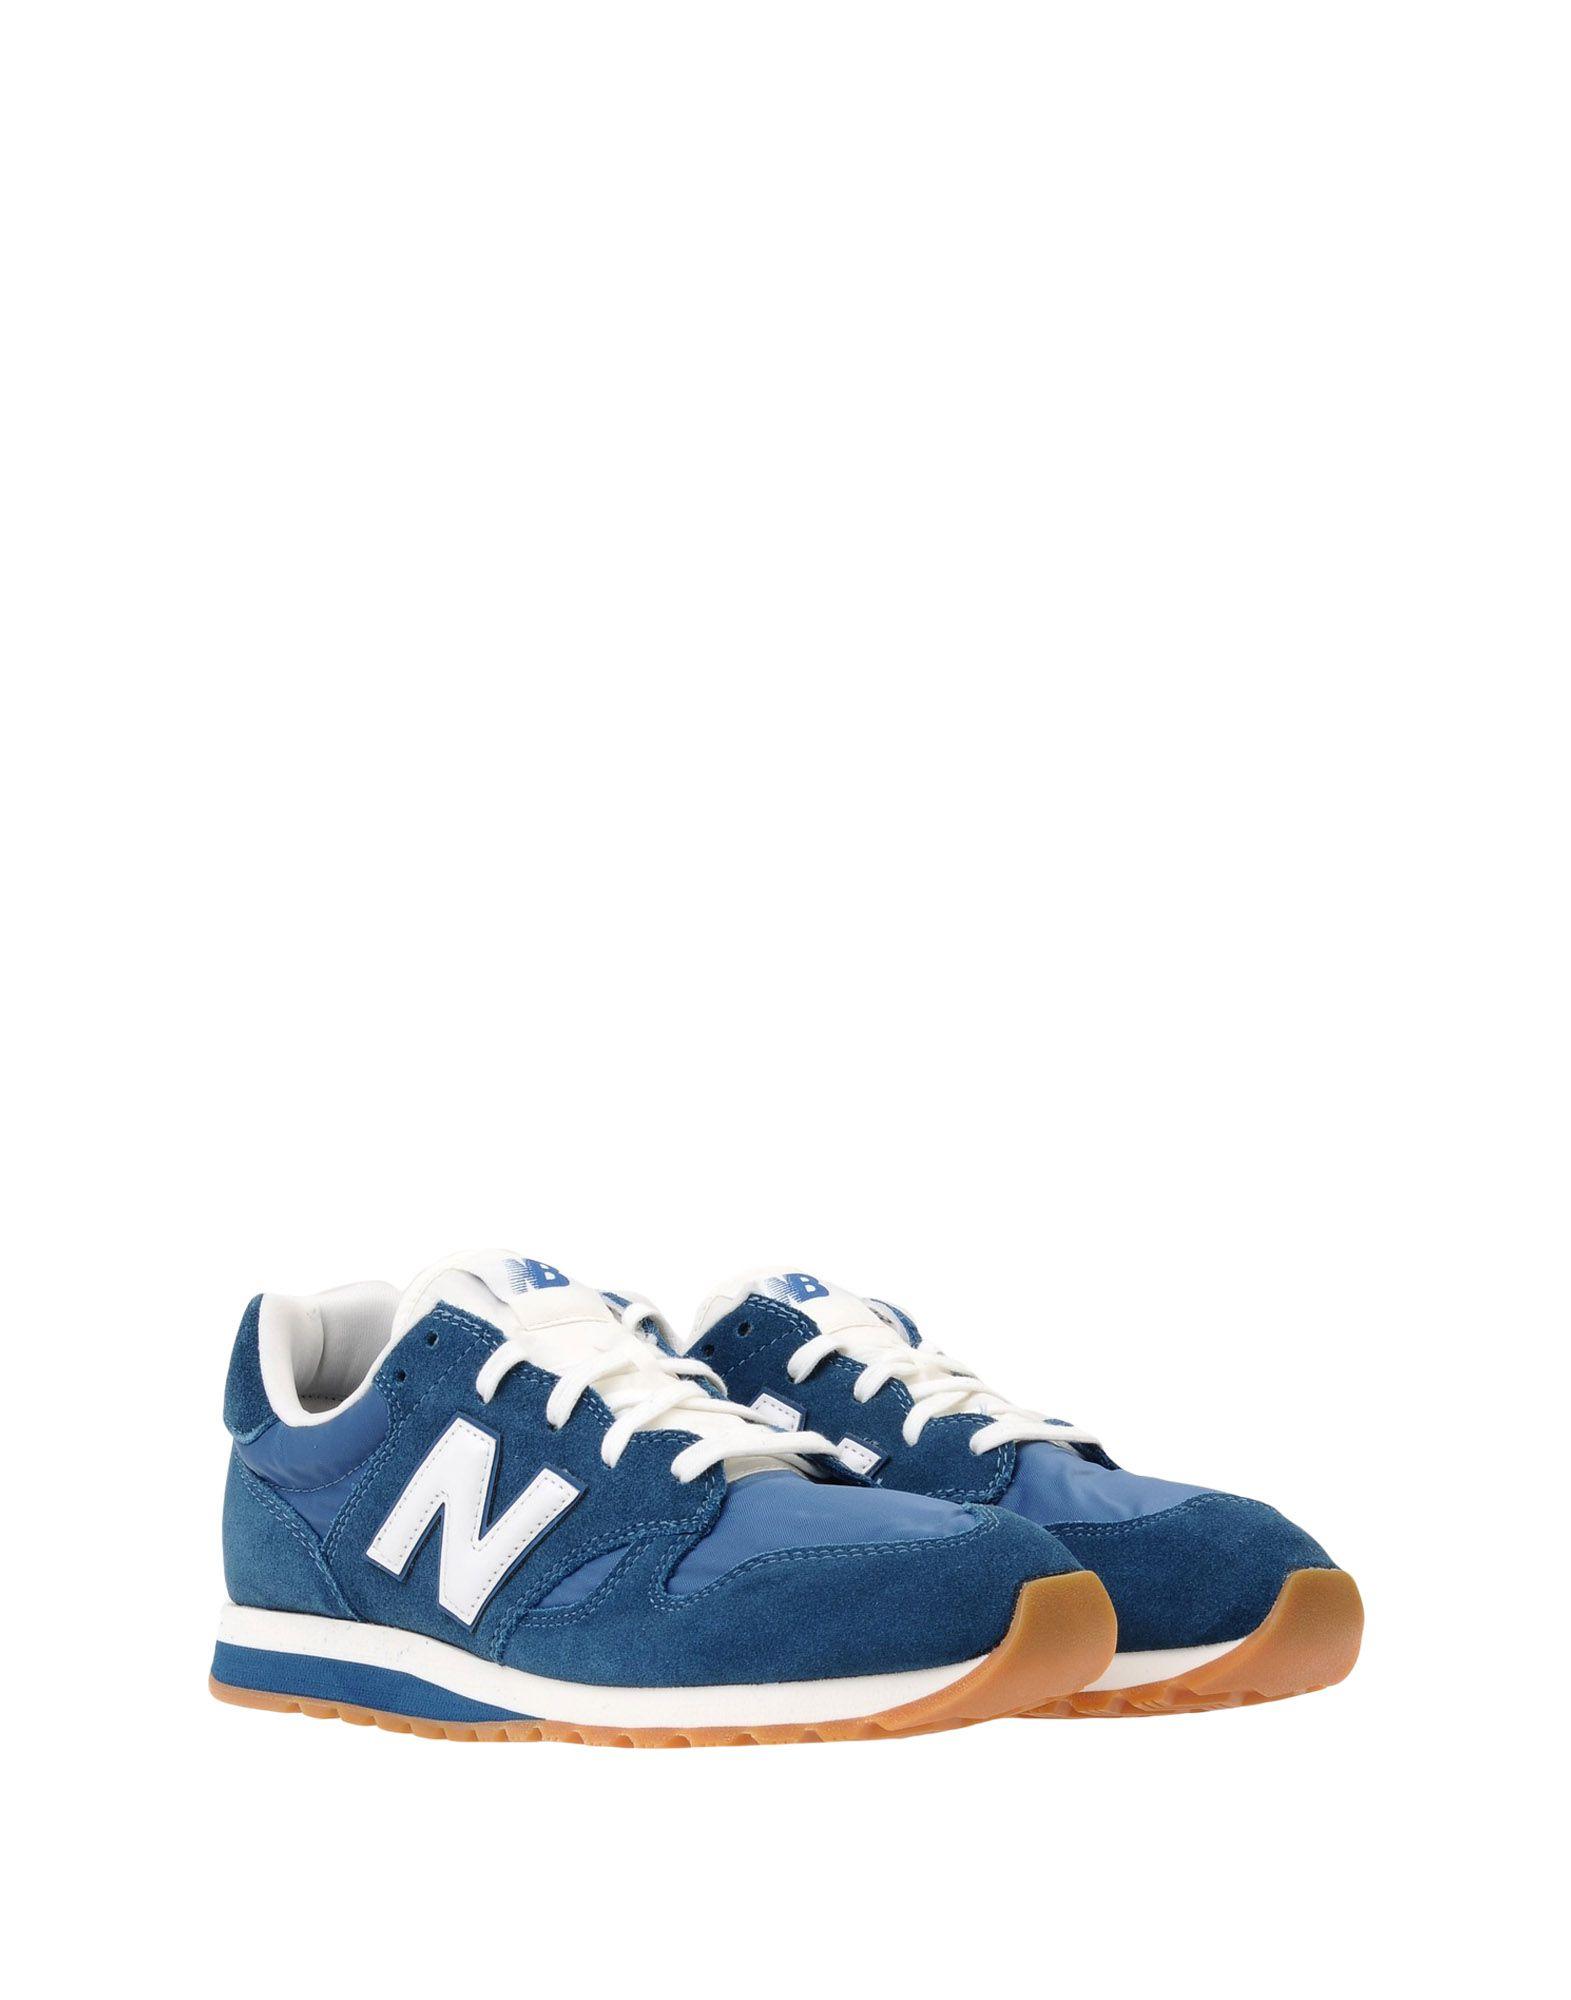 New - Balance 520 Tier 1 - New Sneakers - Men New Balance Sneakers online on  Canada - 11466937BI f4c1b5